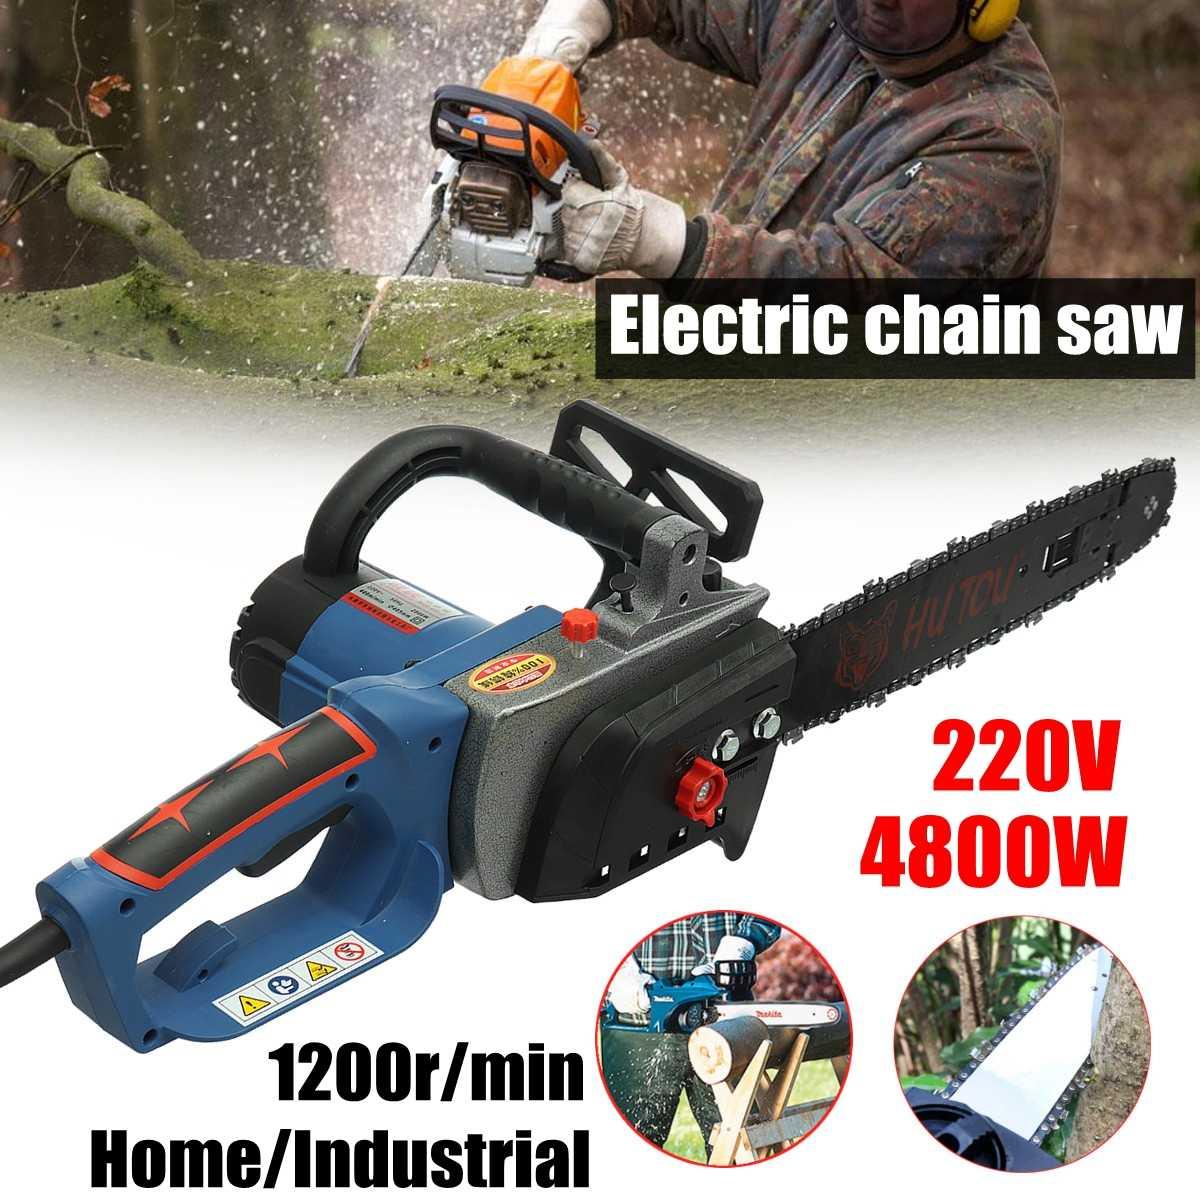 220V 2600w/4800w Home/Industrial Electric Chain Saw Wood Saw Chainsaw 1200r/min Woodworking Chainsaw